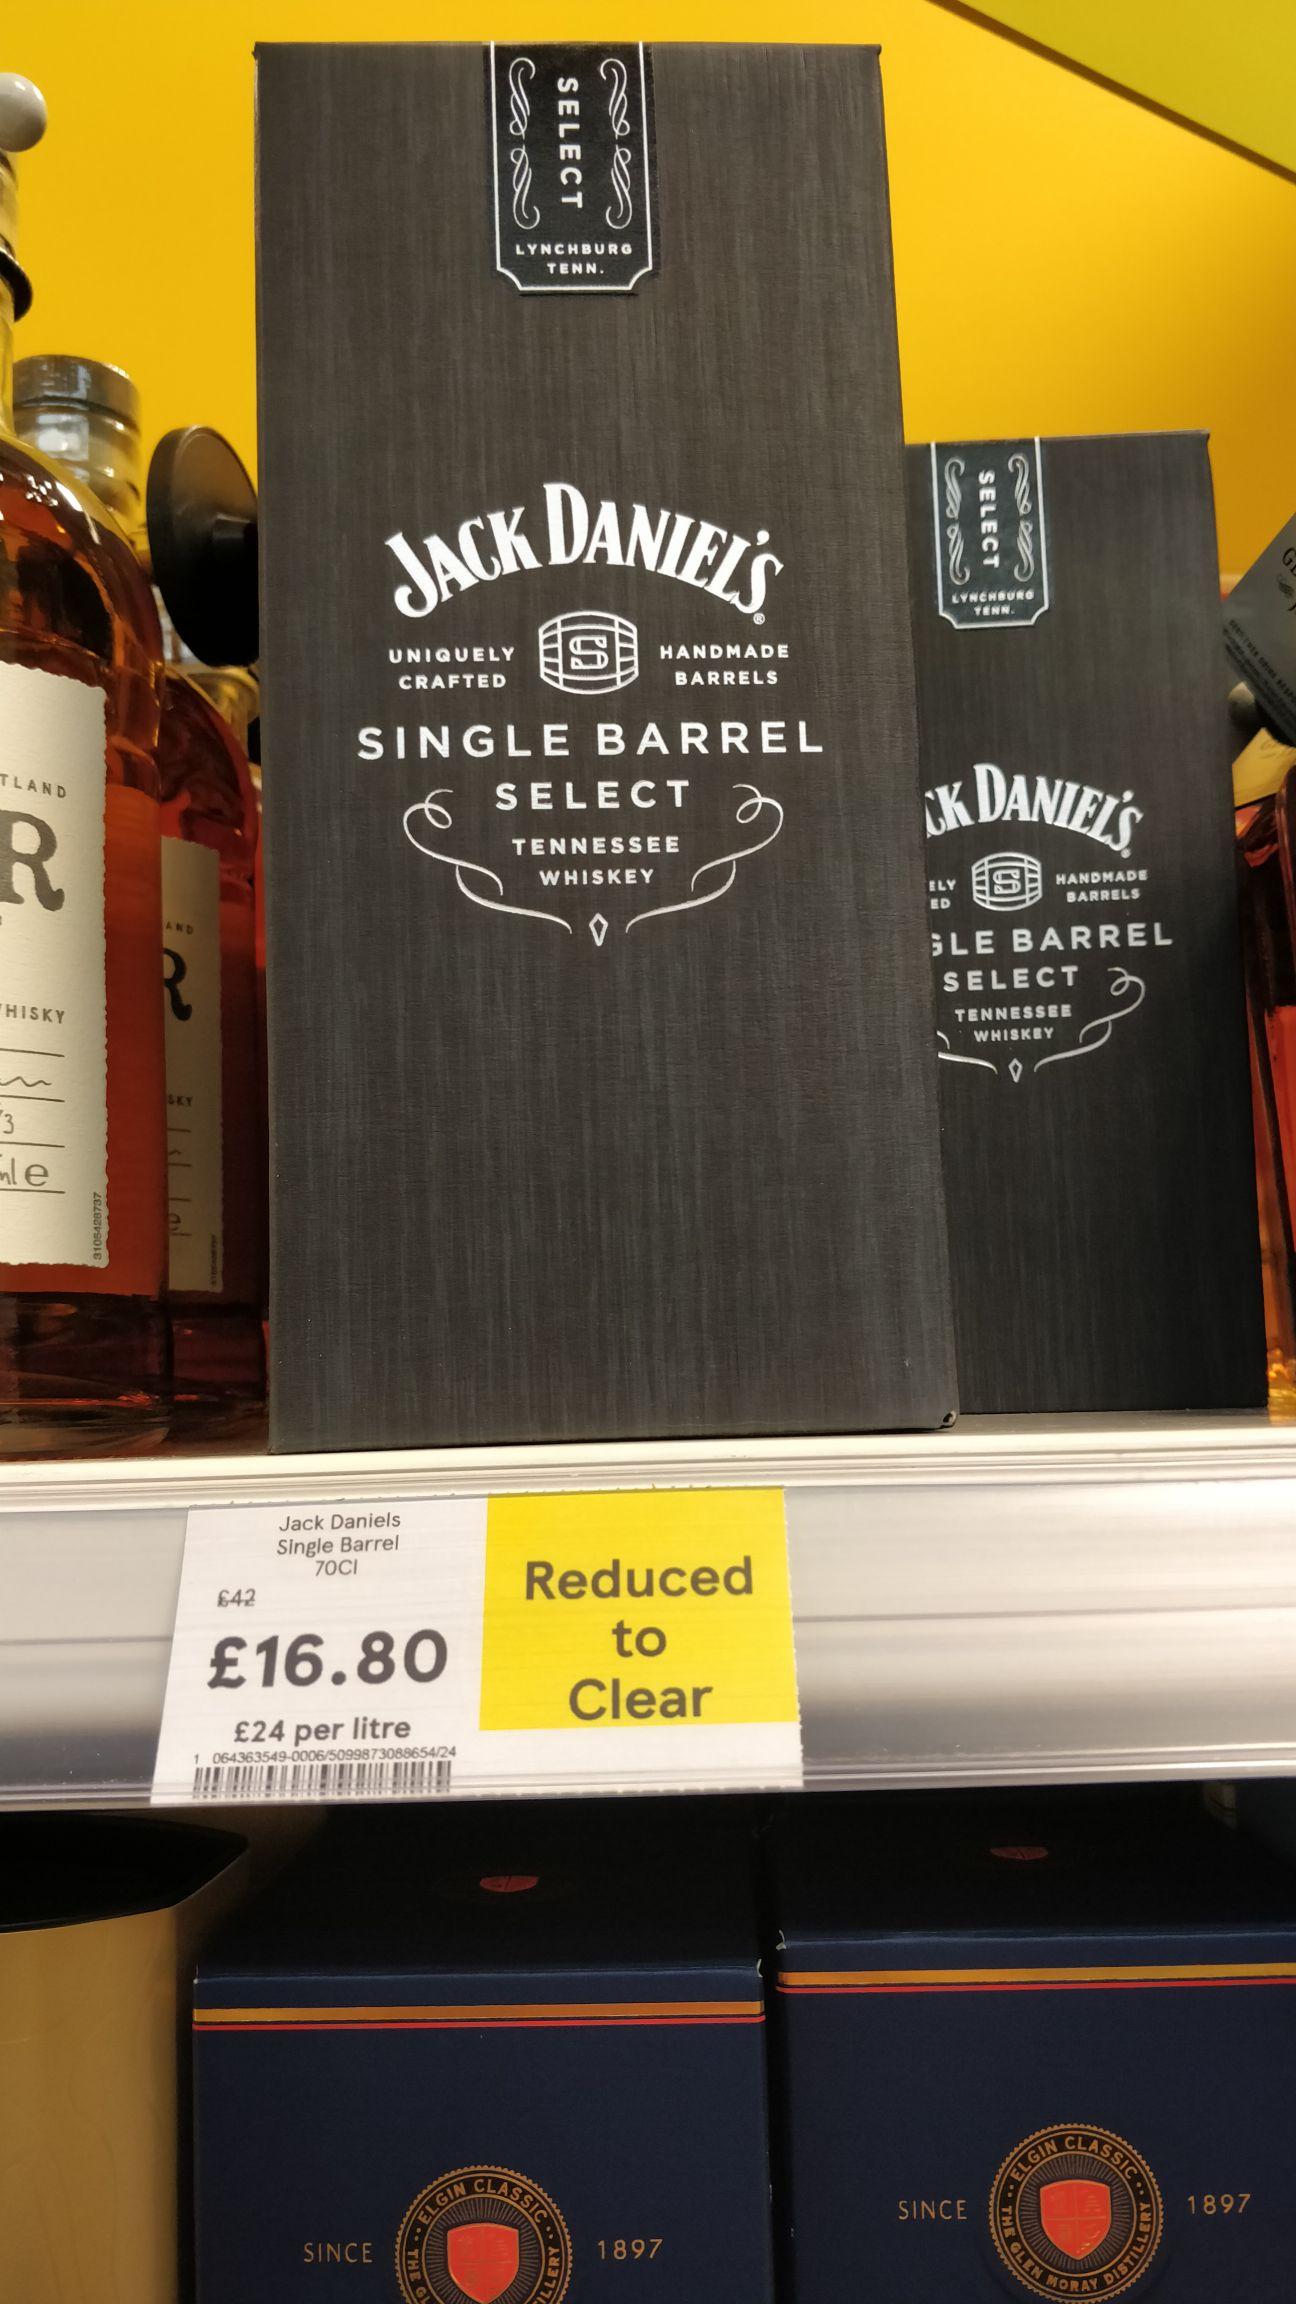 Jack Daniels Single Barrel 70cl Reduced to Clear £16.80 instore @ Tesco Carrickfergus